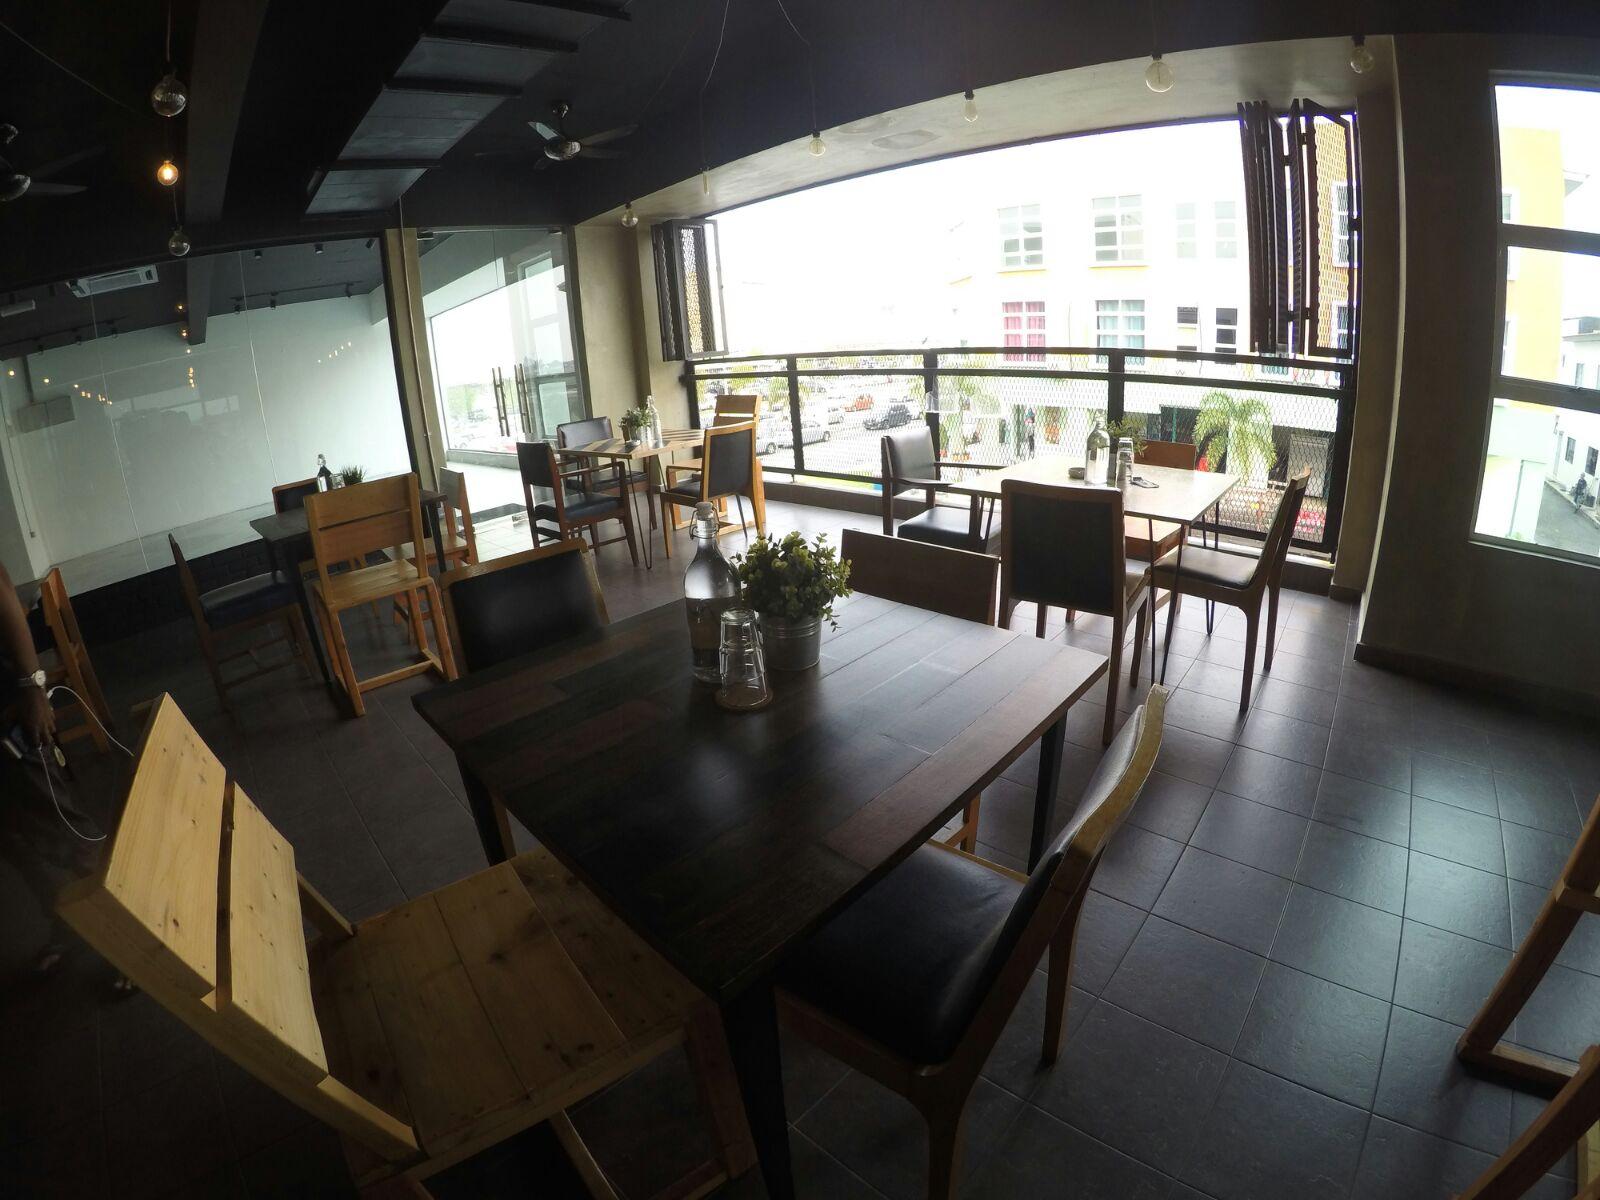 cafe hipster melaka billionaires concept cuisine ahmad fauzi aryaan. Black Bedroom Furniture Sets. Home Design Ideas